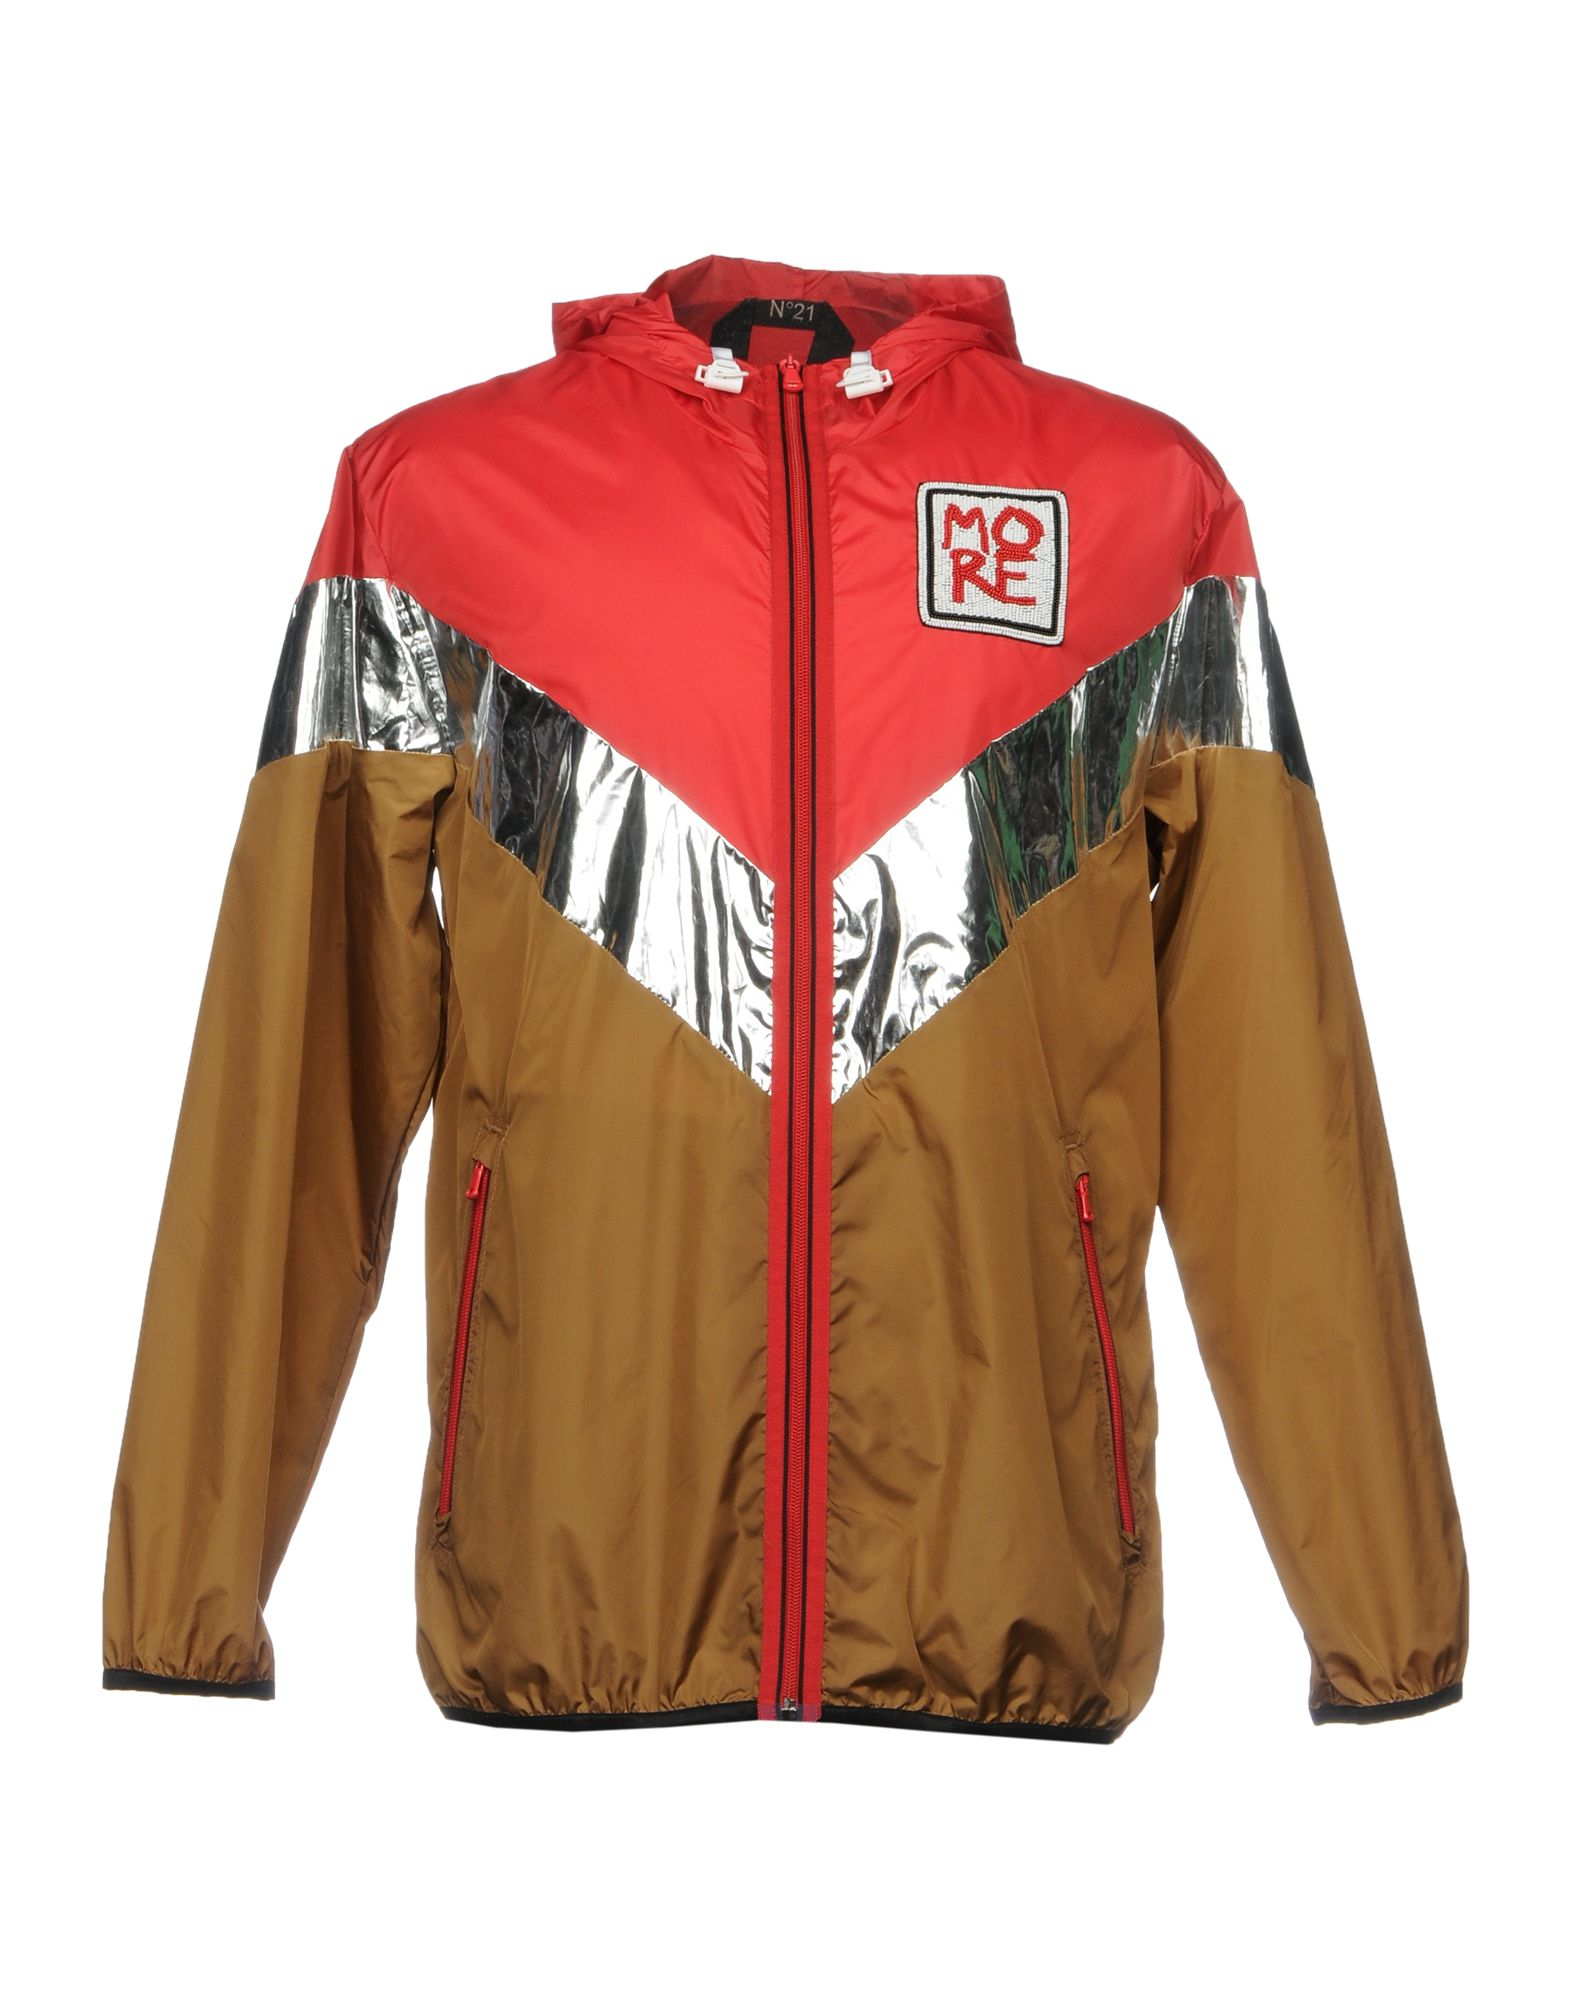 ФОТО n° 21 Куртка